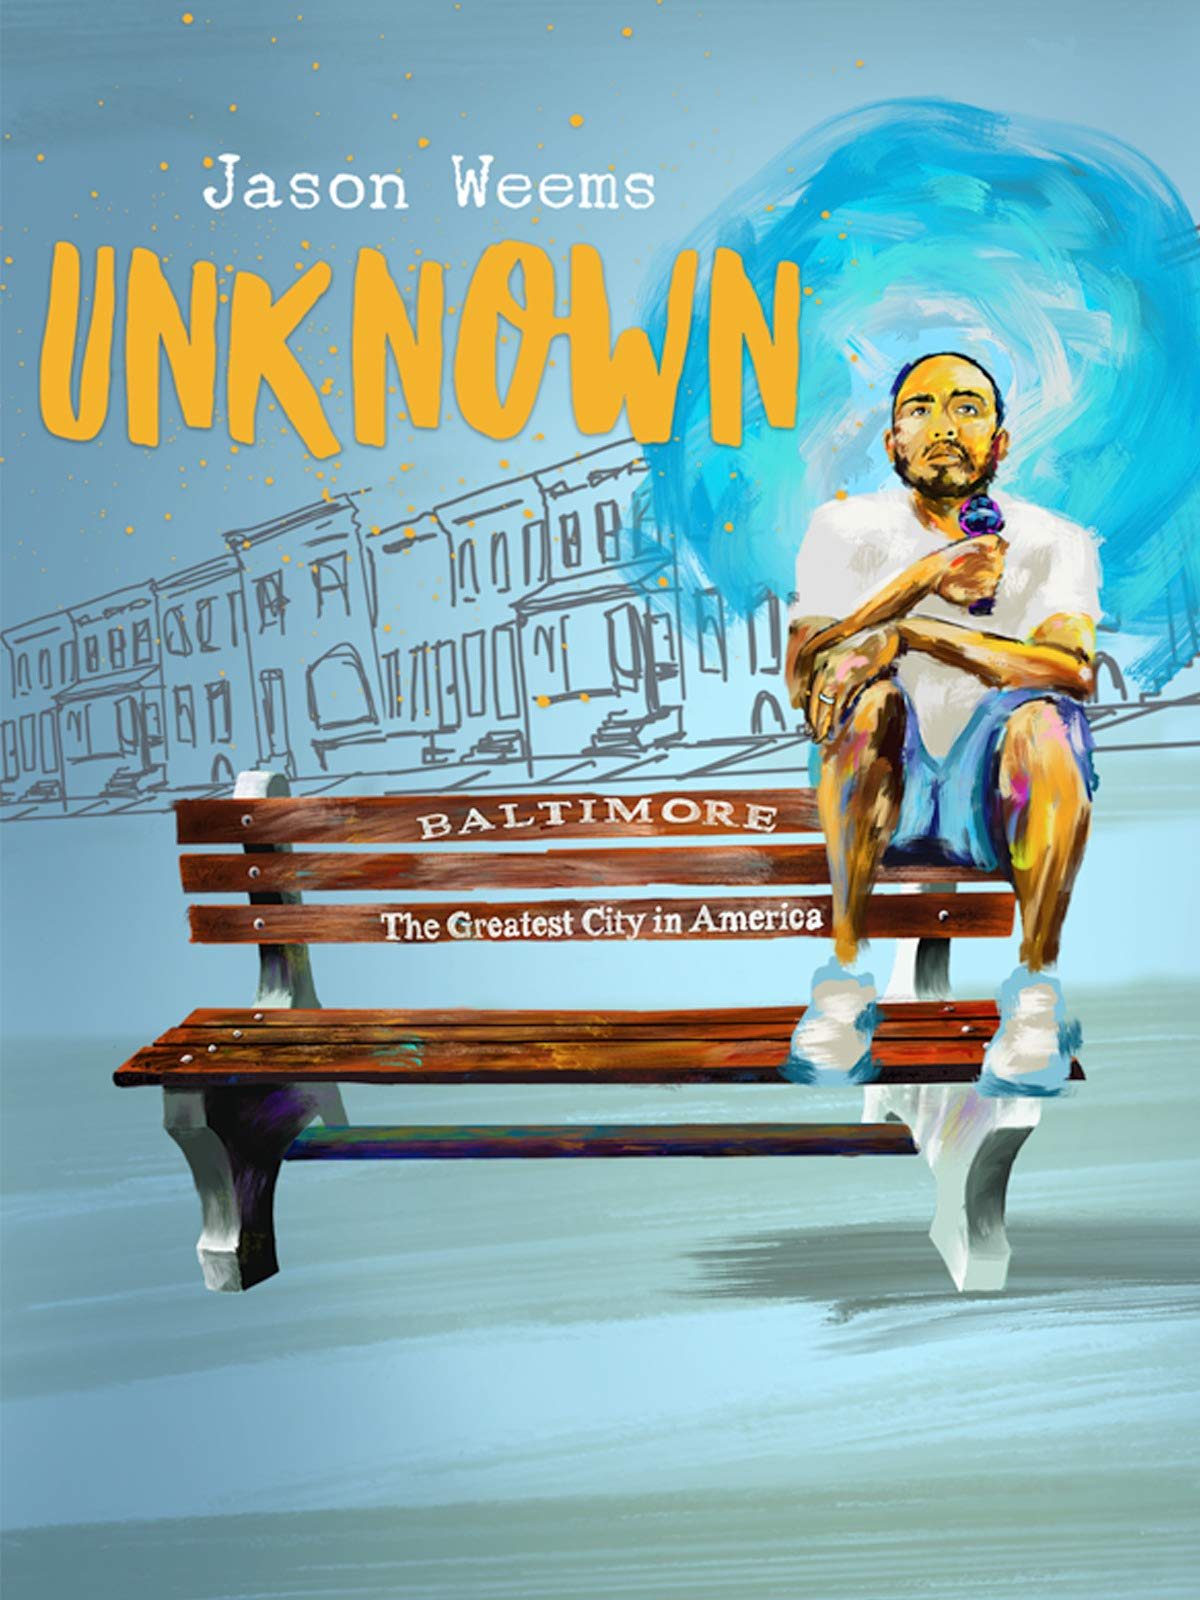 Jason Weems: Unknown on Amazon Prime Video UK